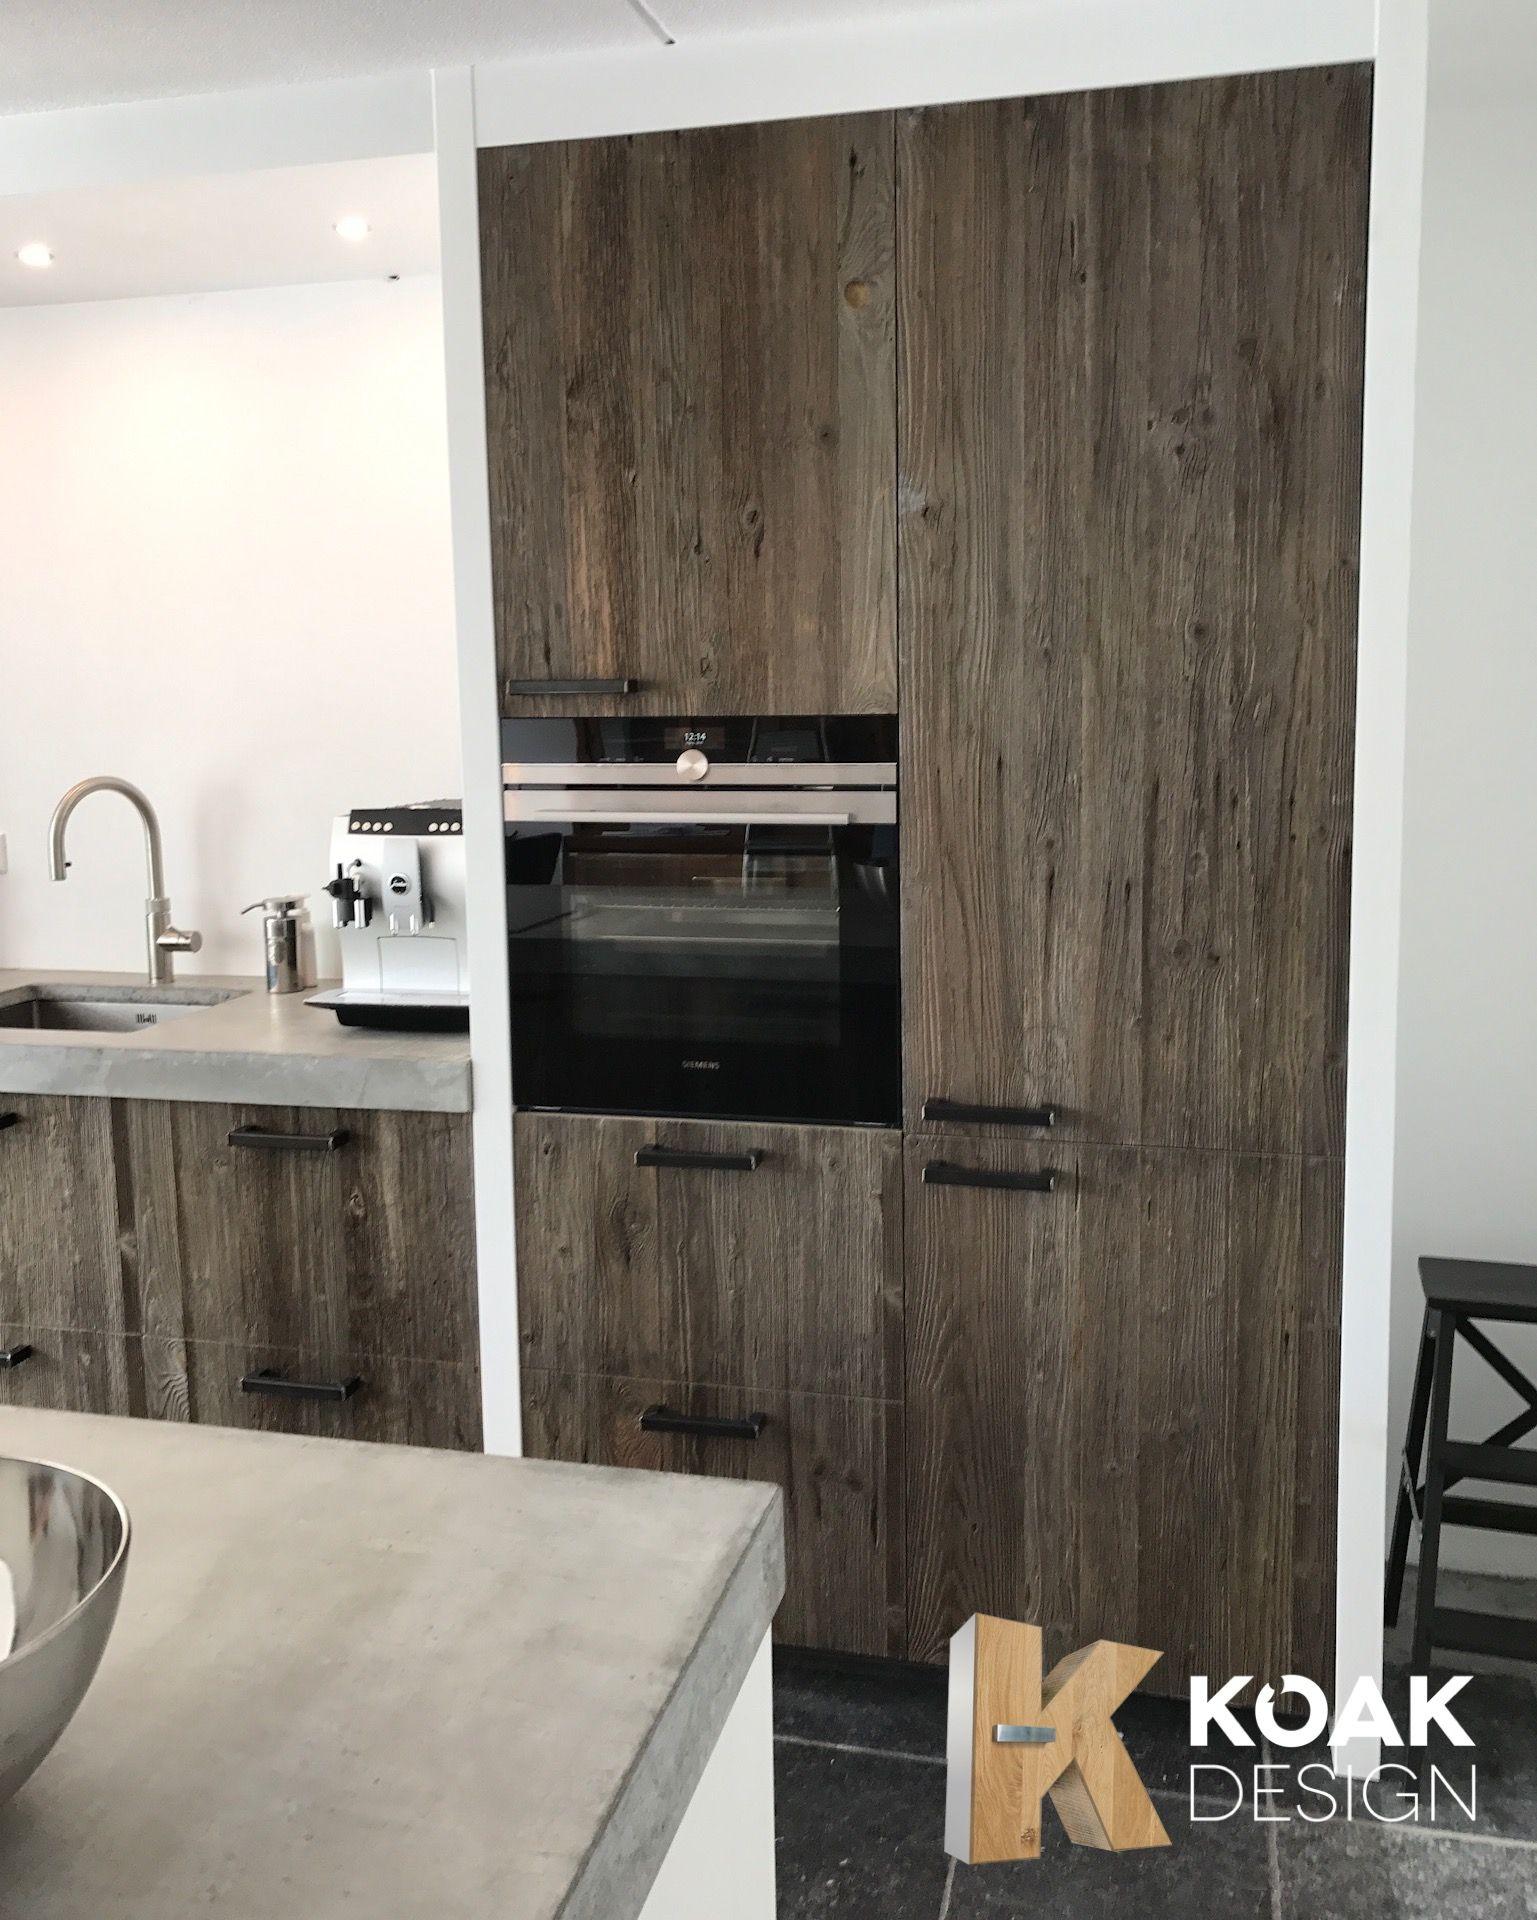 cabinet barnwood doors cabinets design kitchen ikea hack with koak your pin create